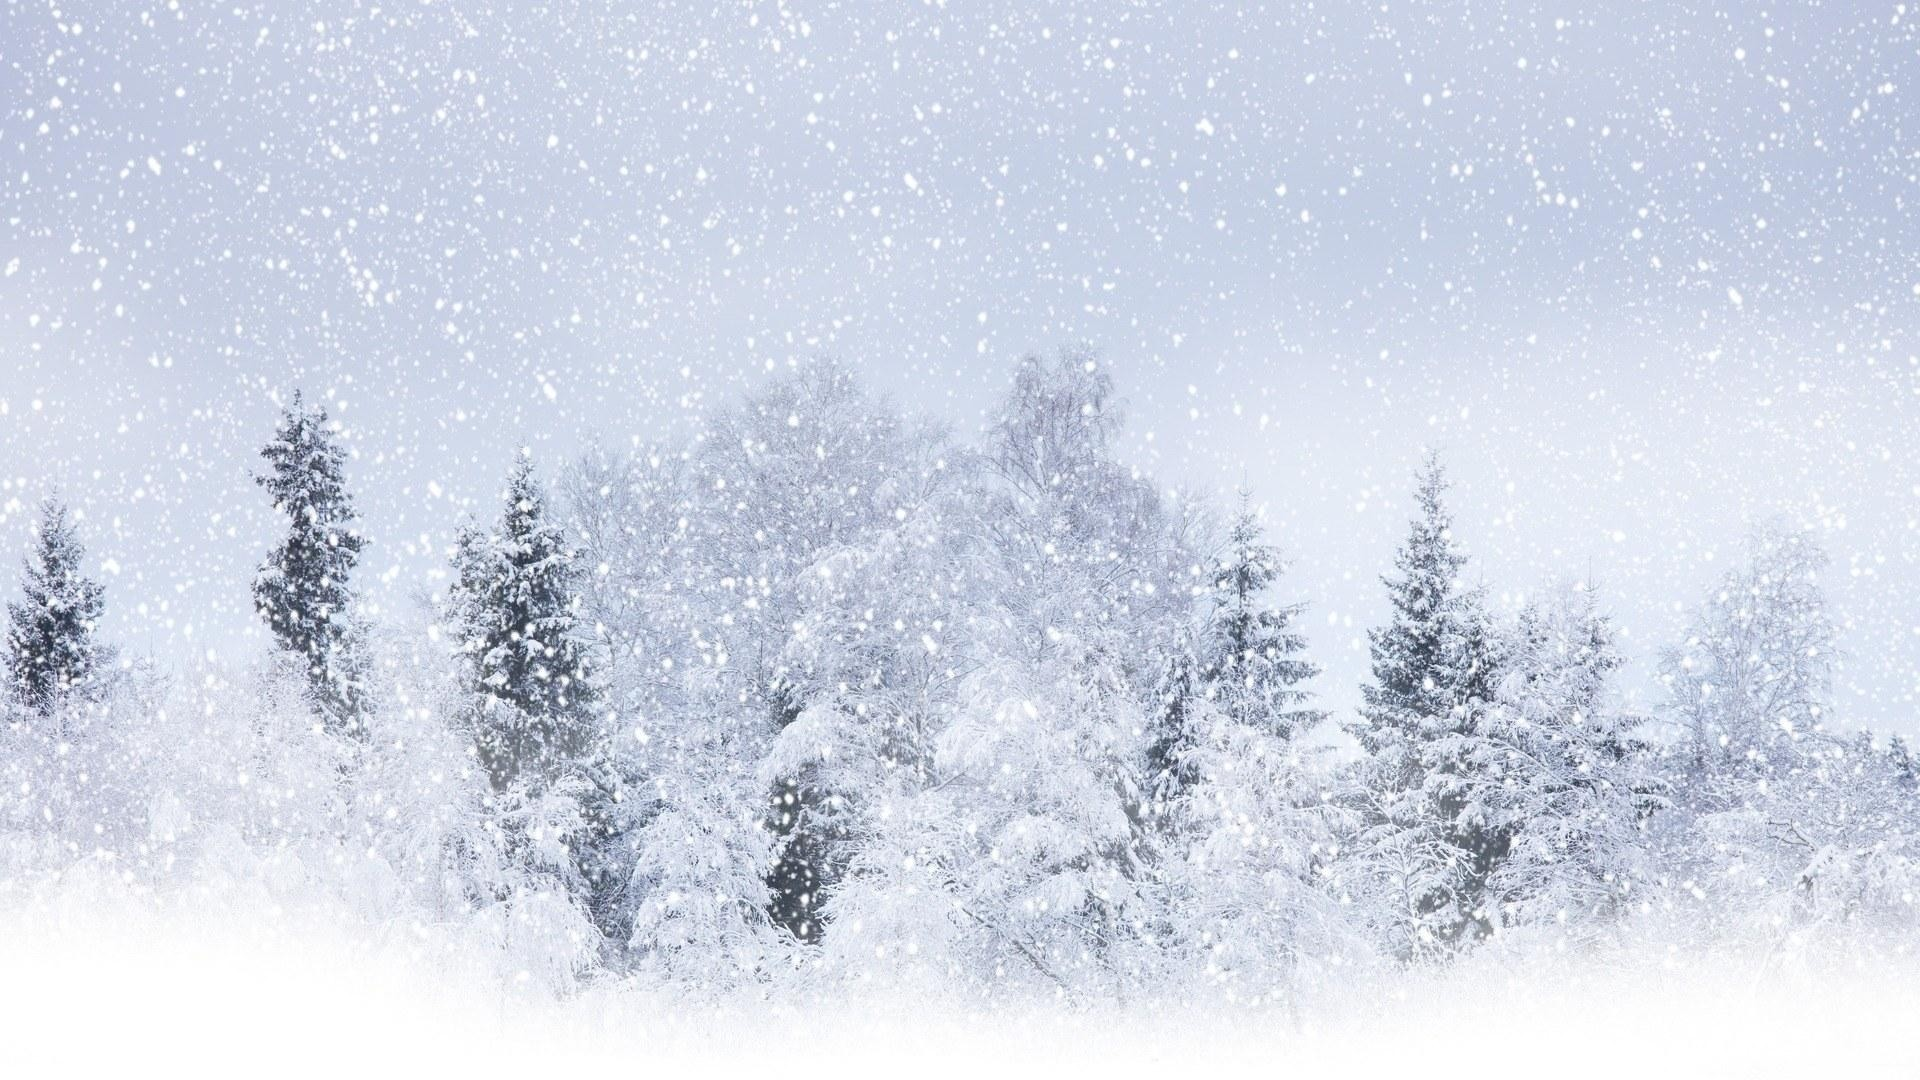 Full HD 1080p Snowfall Wallpapers HD, Desktop Backgrounds 1920×1080